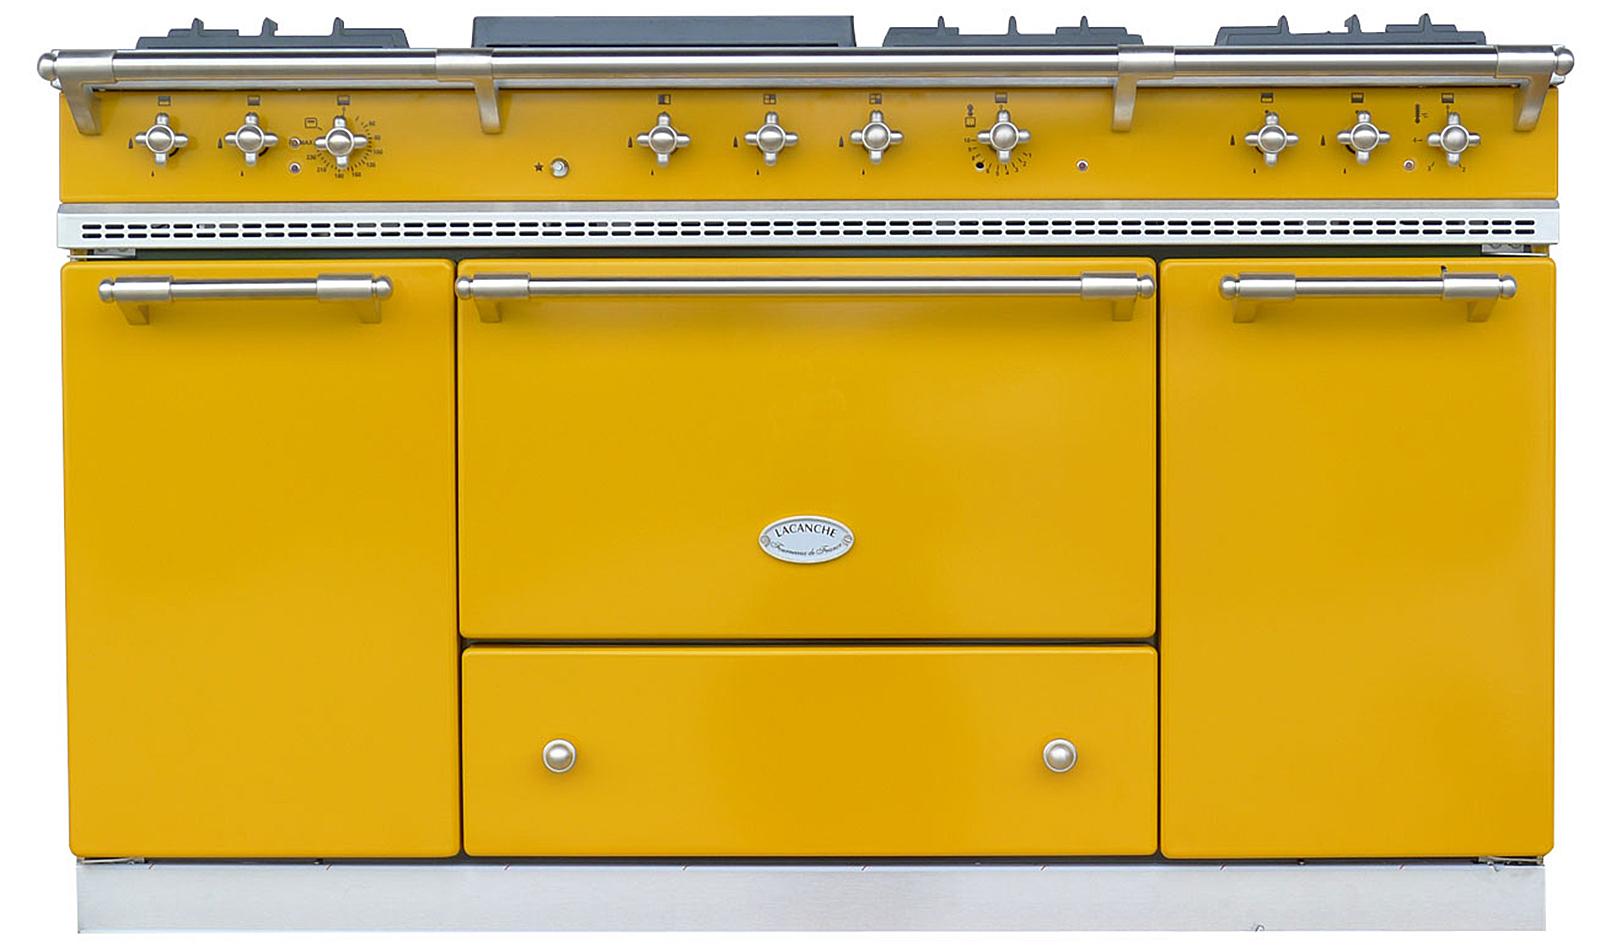 lacanche fontenay 150cm gasherd standherd welter und welter k ln. Black Bedroom Furniture Sets. Home Design Ideas